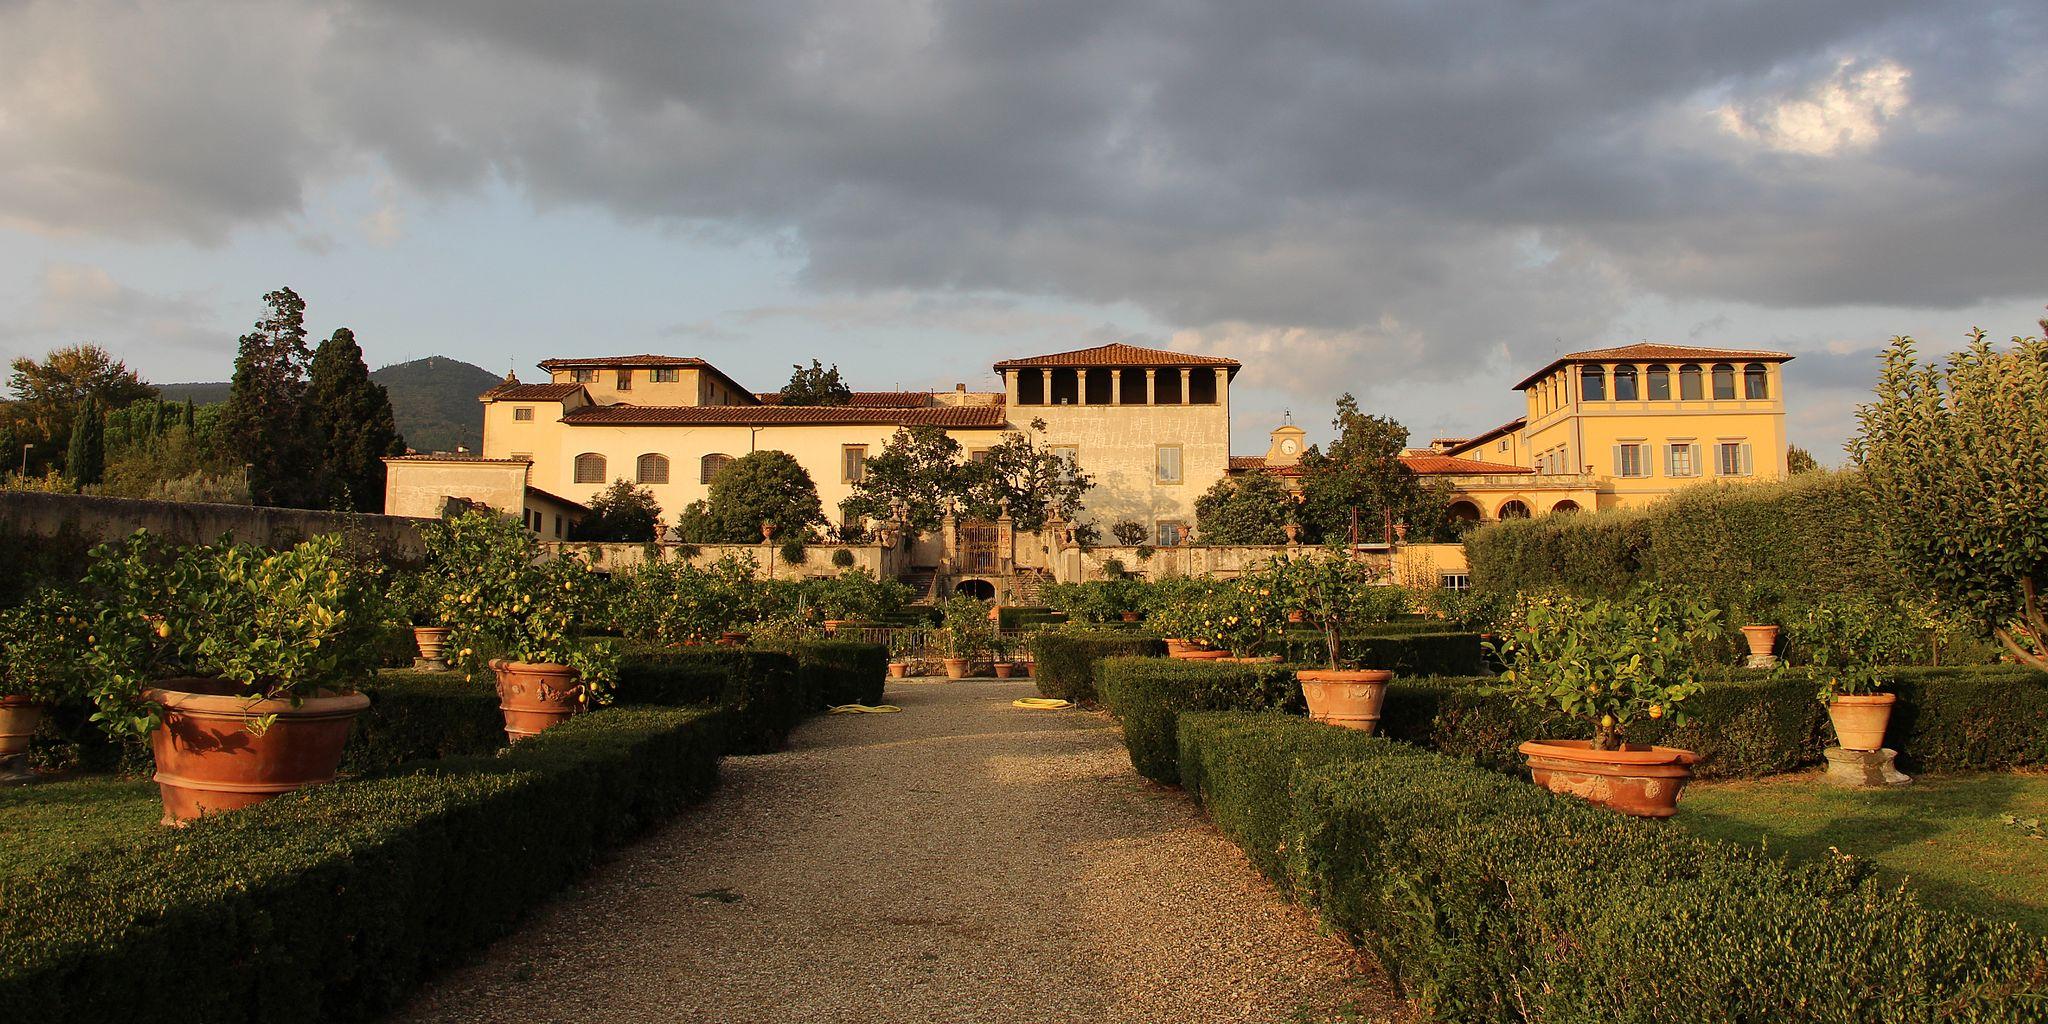 Villa la quiete, veduta dal giardino 01